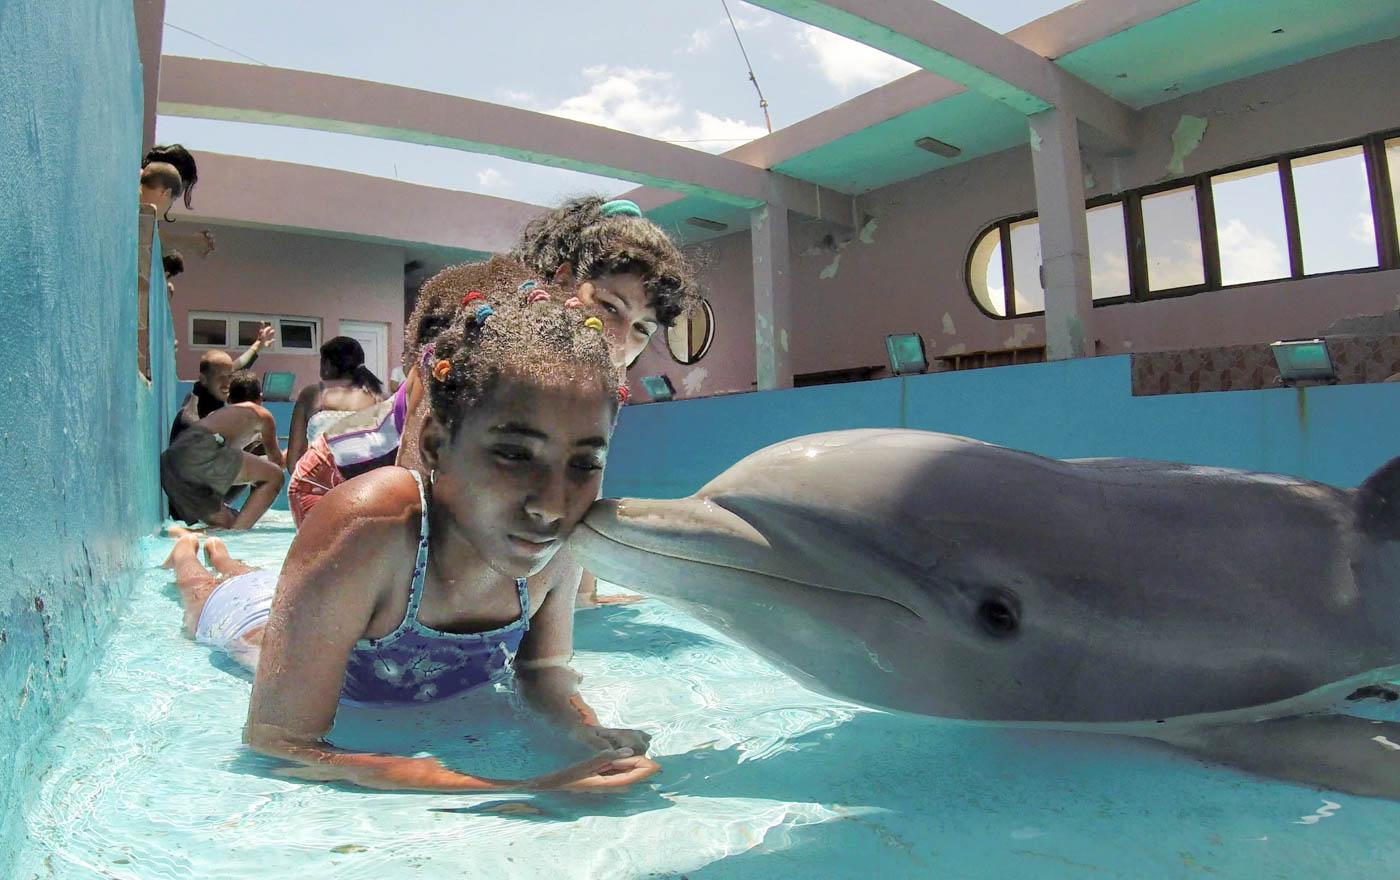 En un centro de rehabilitación de Cuba, un delfín besa a Lagna Fuentes